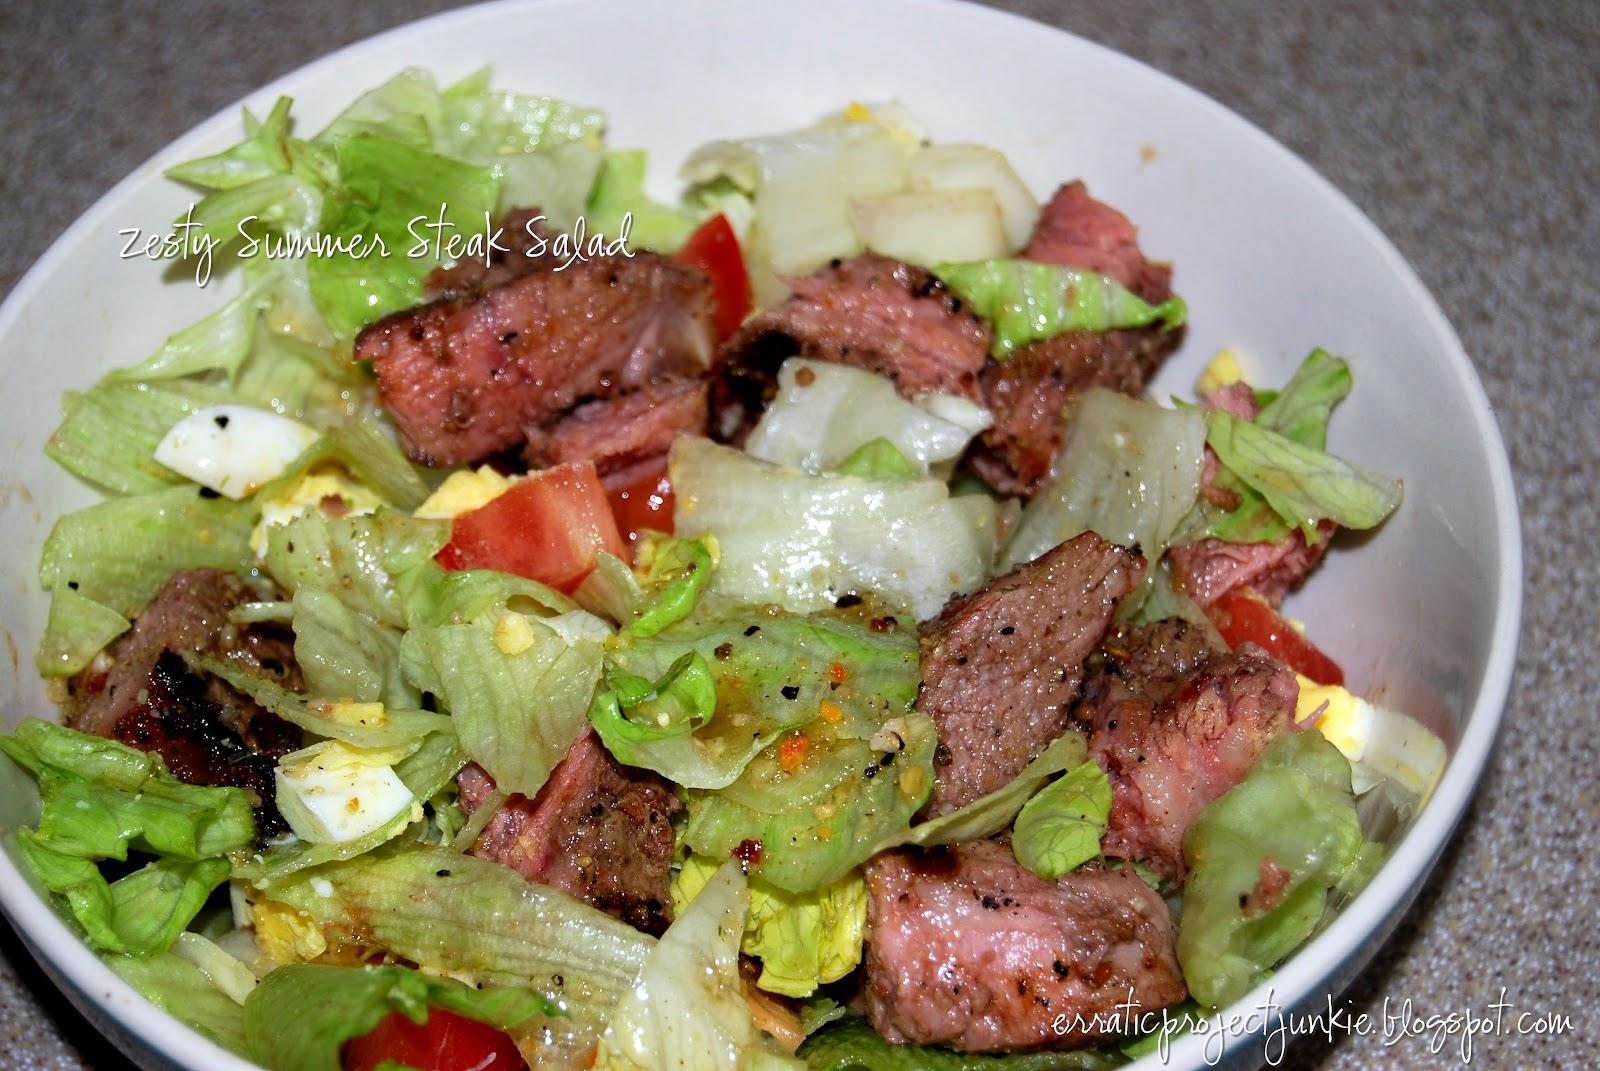 ... Project Junkie: Zesty Summer Steak Salad: A Lazy Blogger's Meal